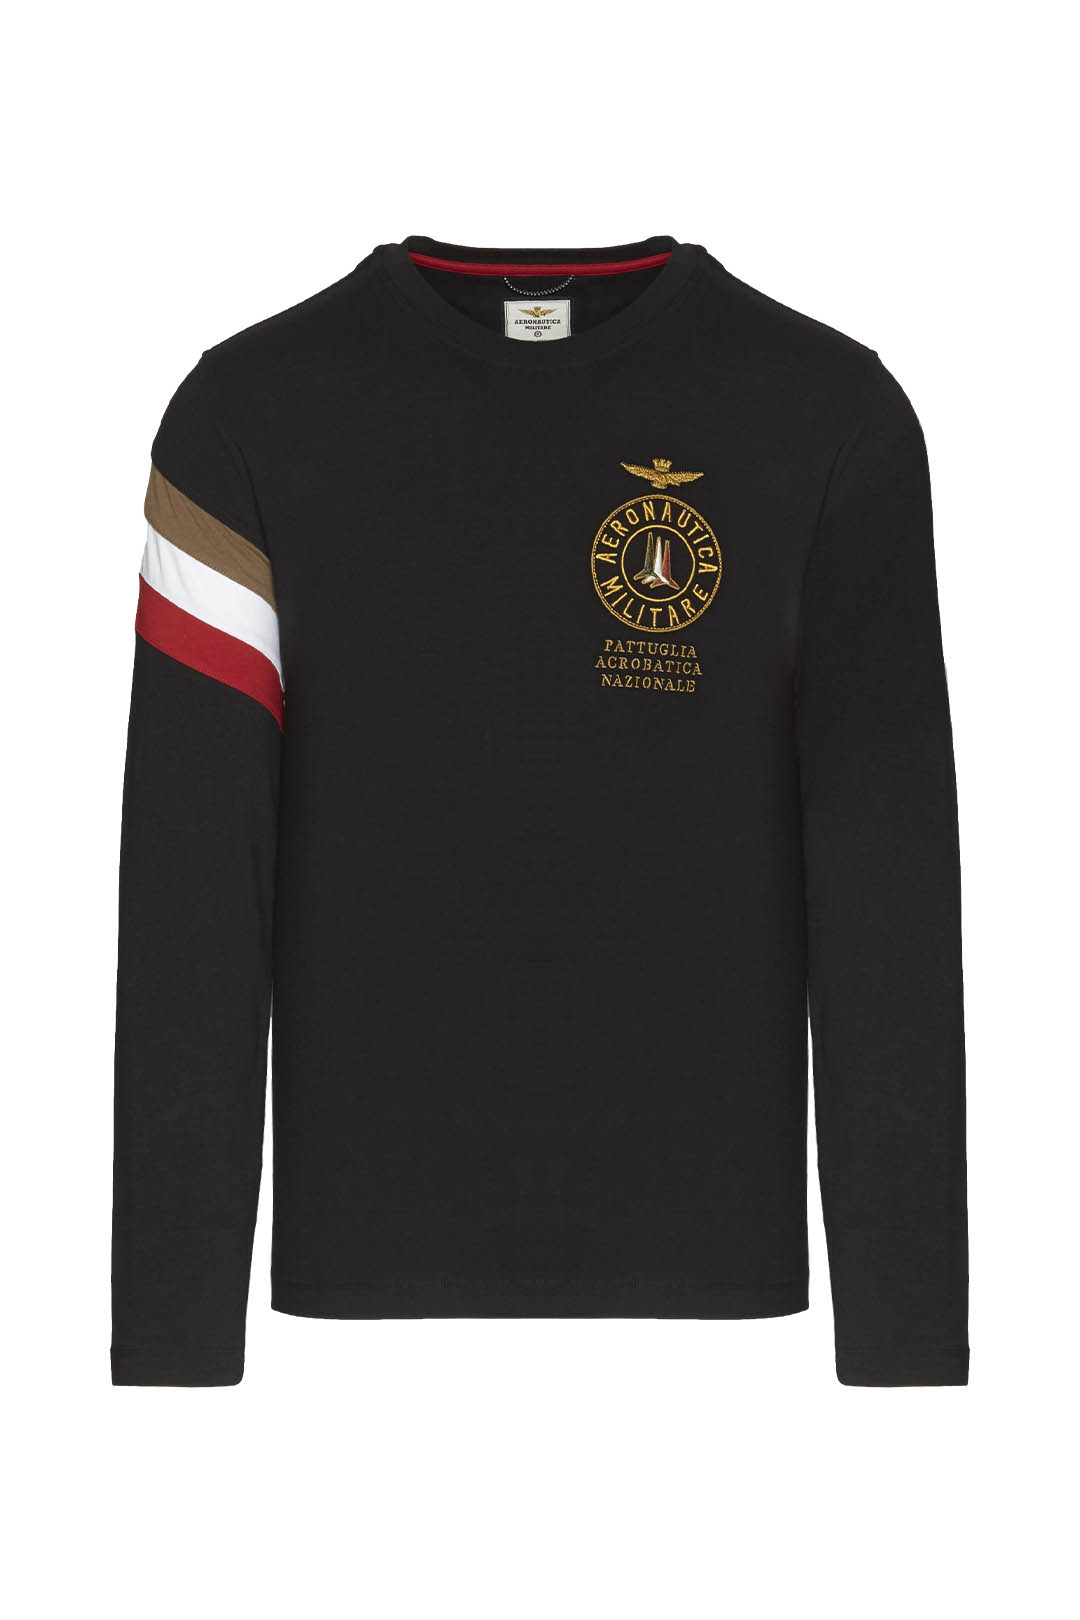 Frecce Tricolori T-shirt mit Einsatz     1